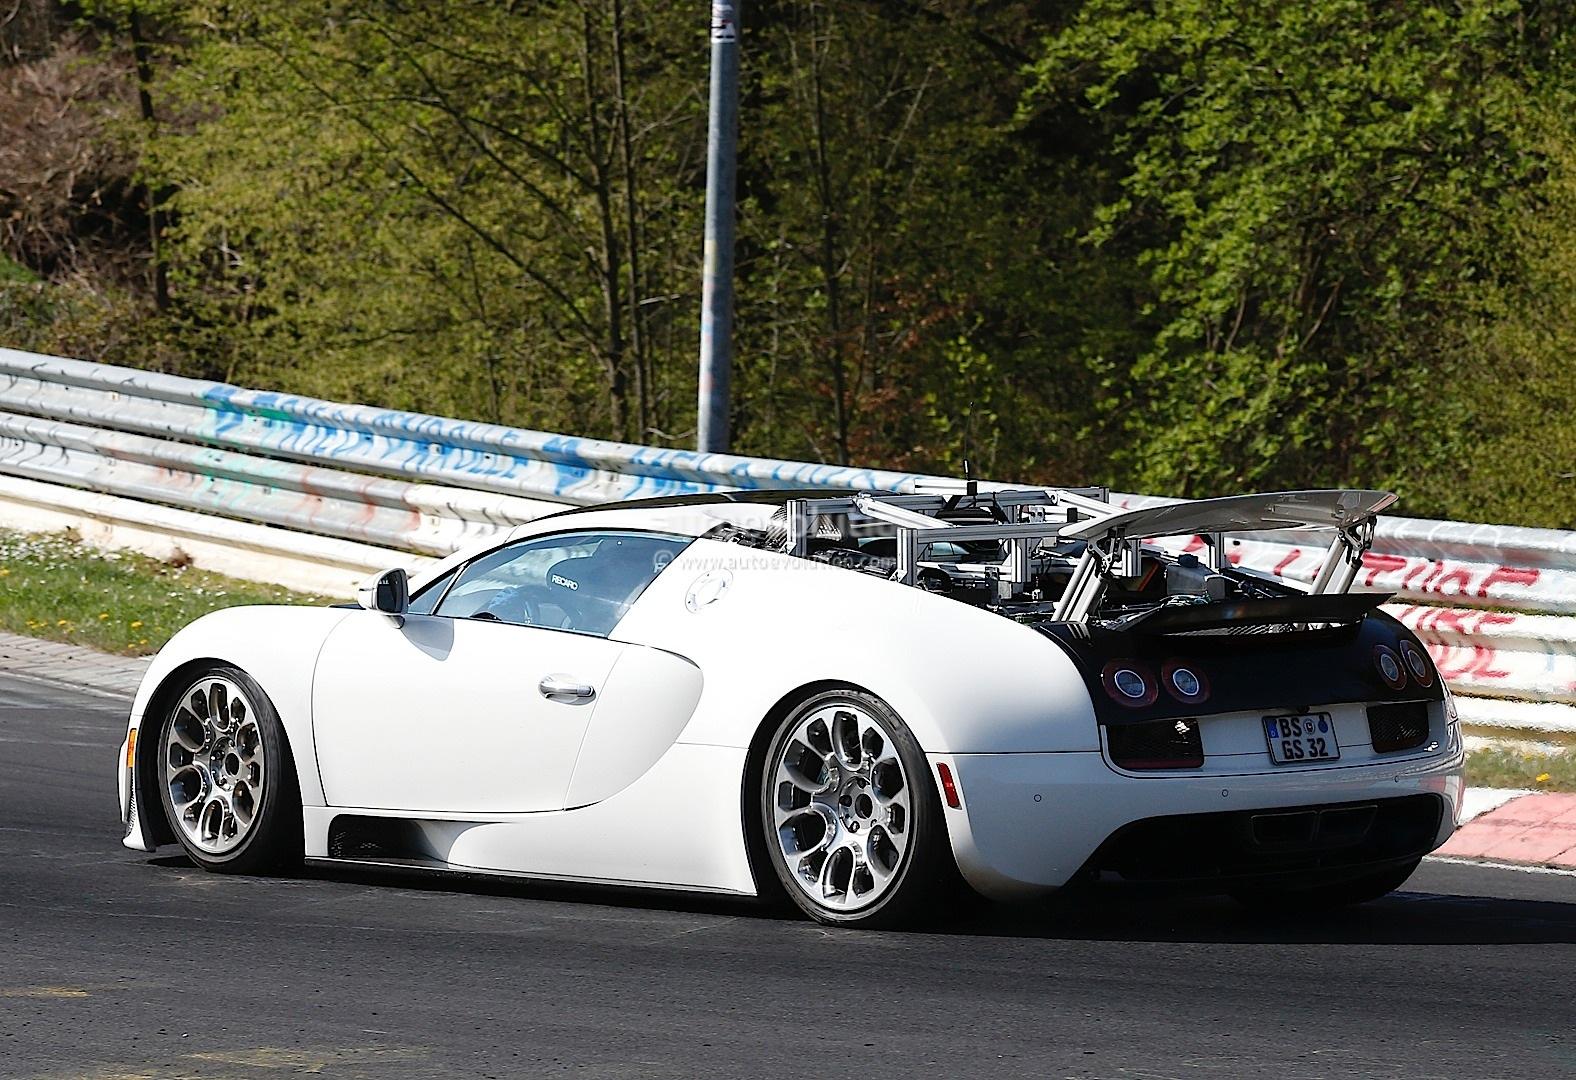 bugatti veyron test mules spied on nurburgring hint at hybrid sucessor autoevolution. Black Bedroom Furniture Sets. Home Design Ideas